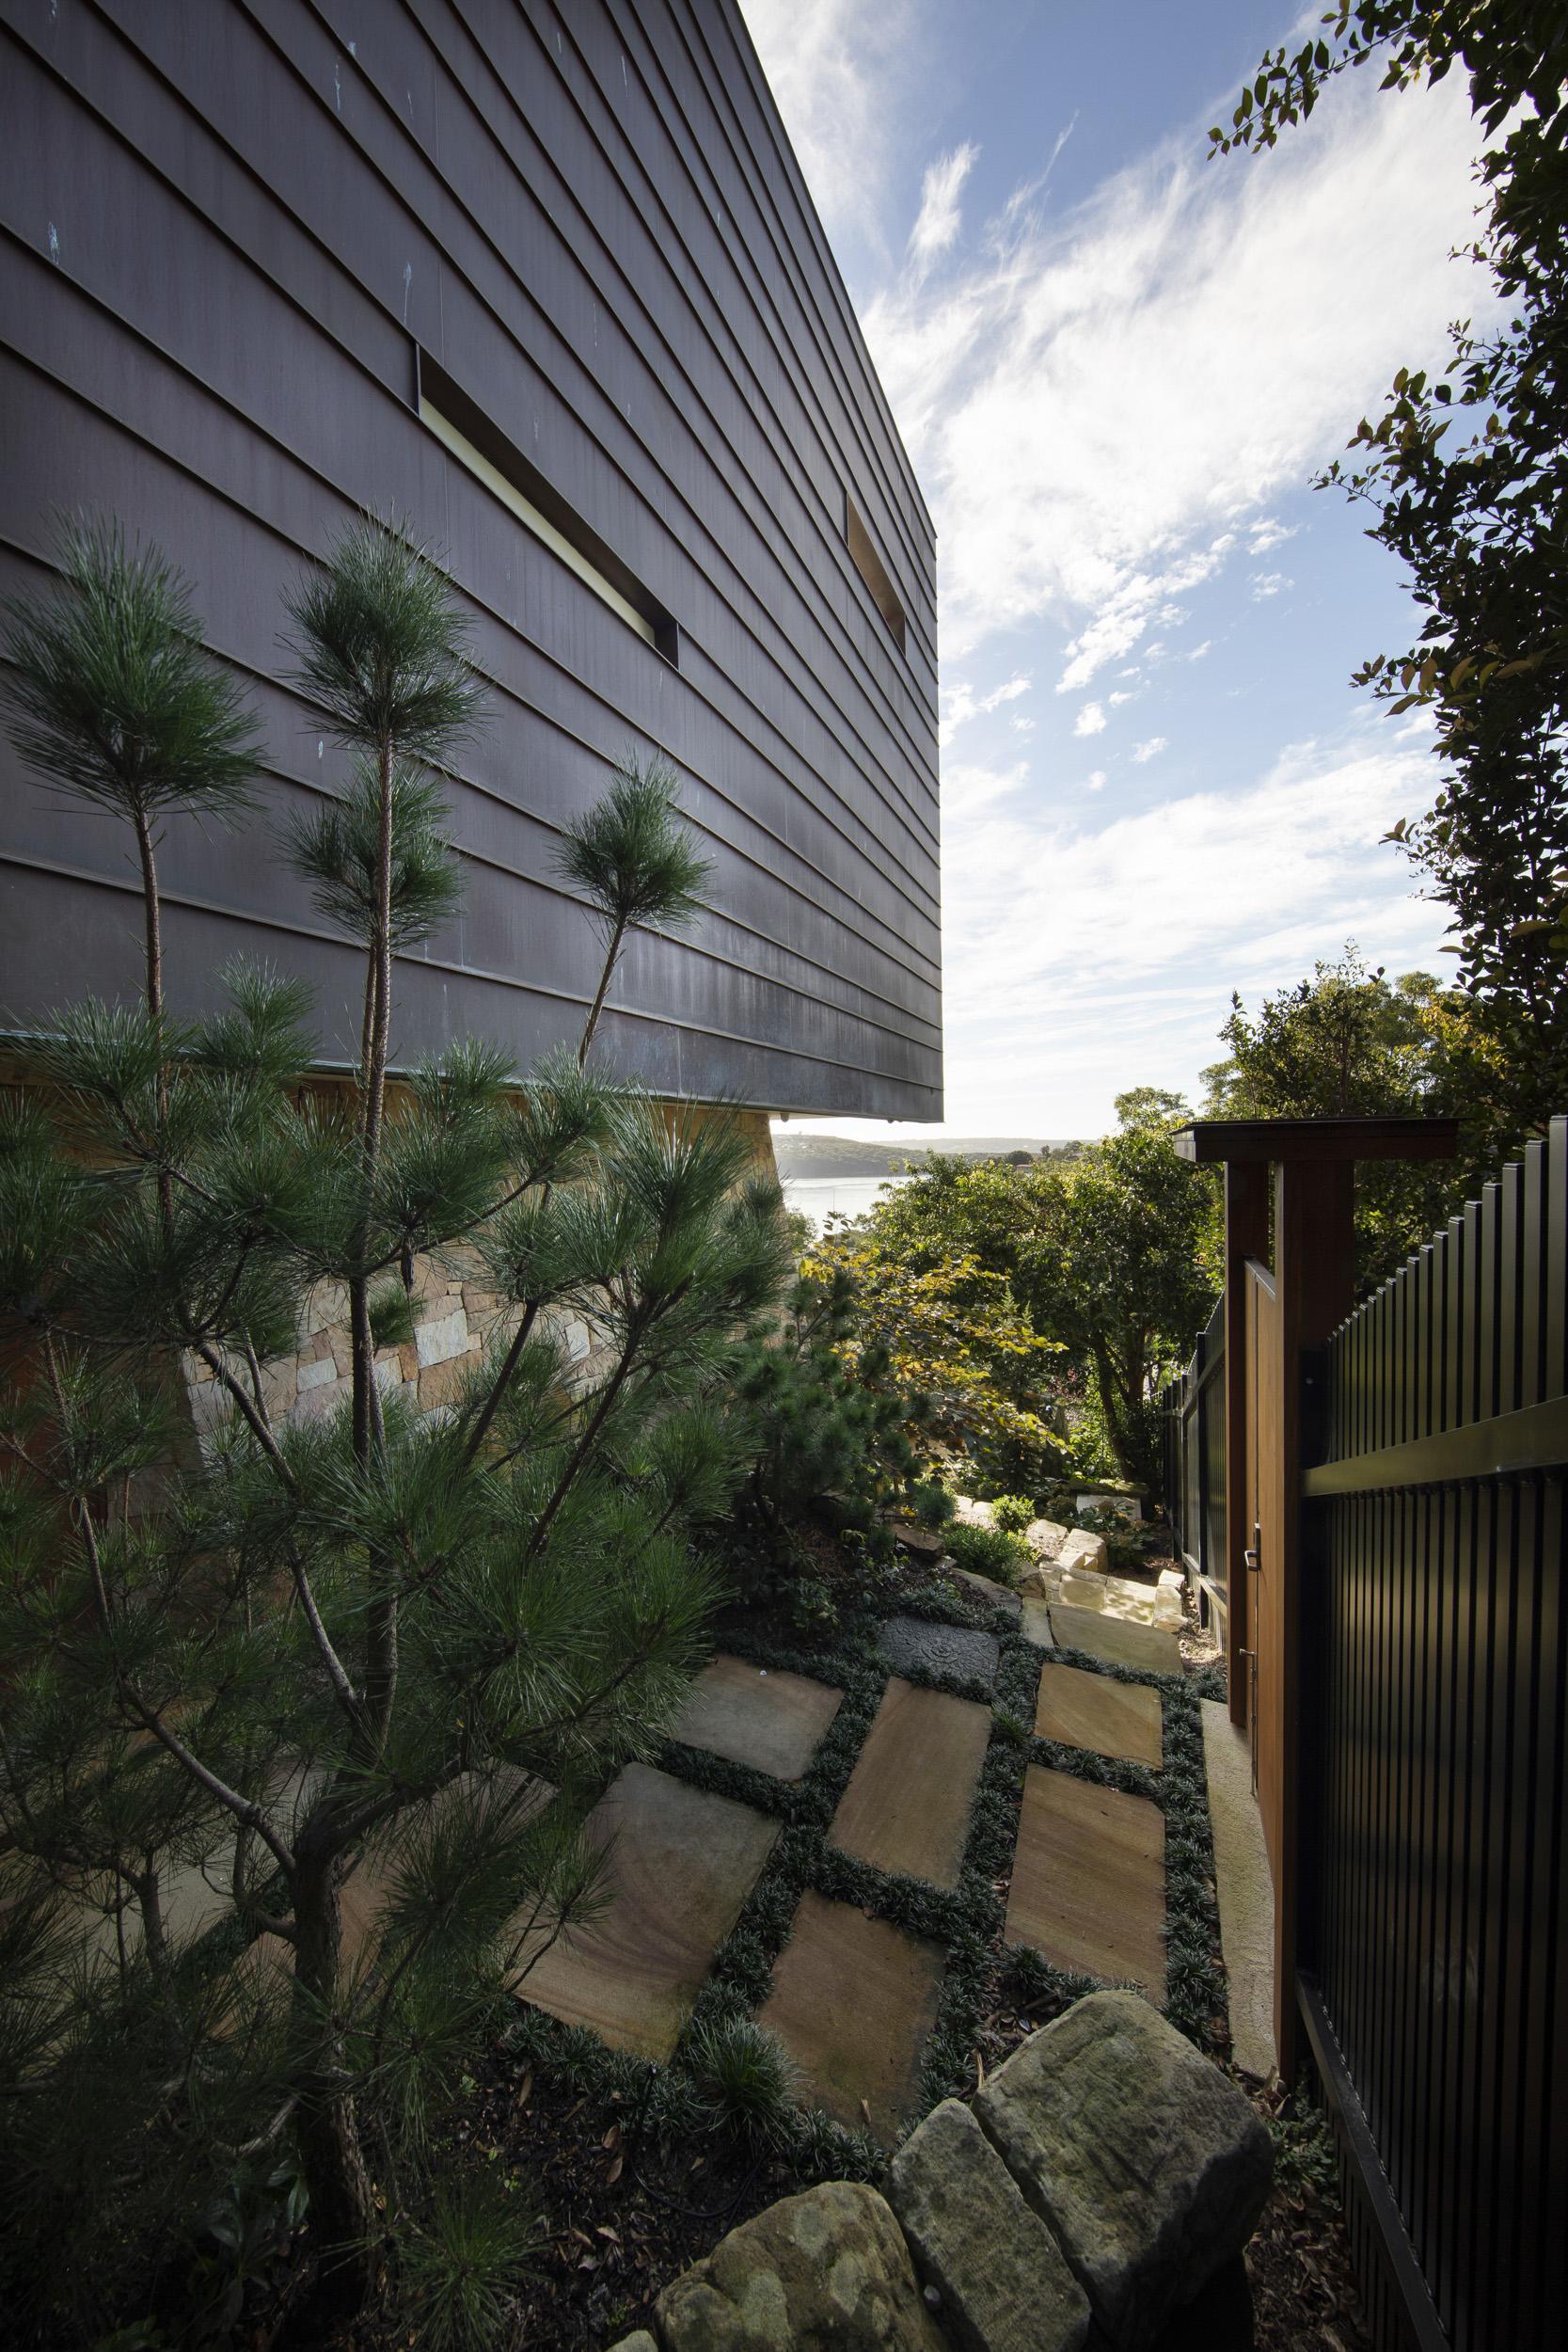 residential_architect_photographer_sydney_19.jpg